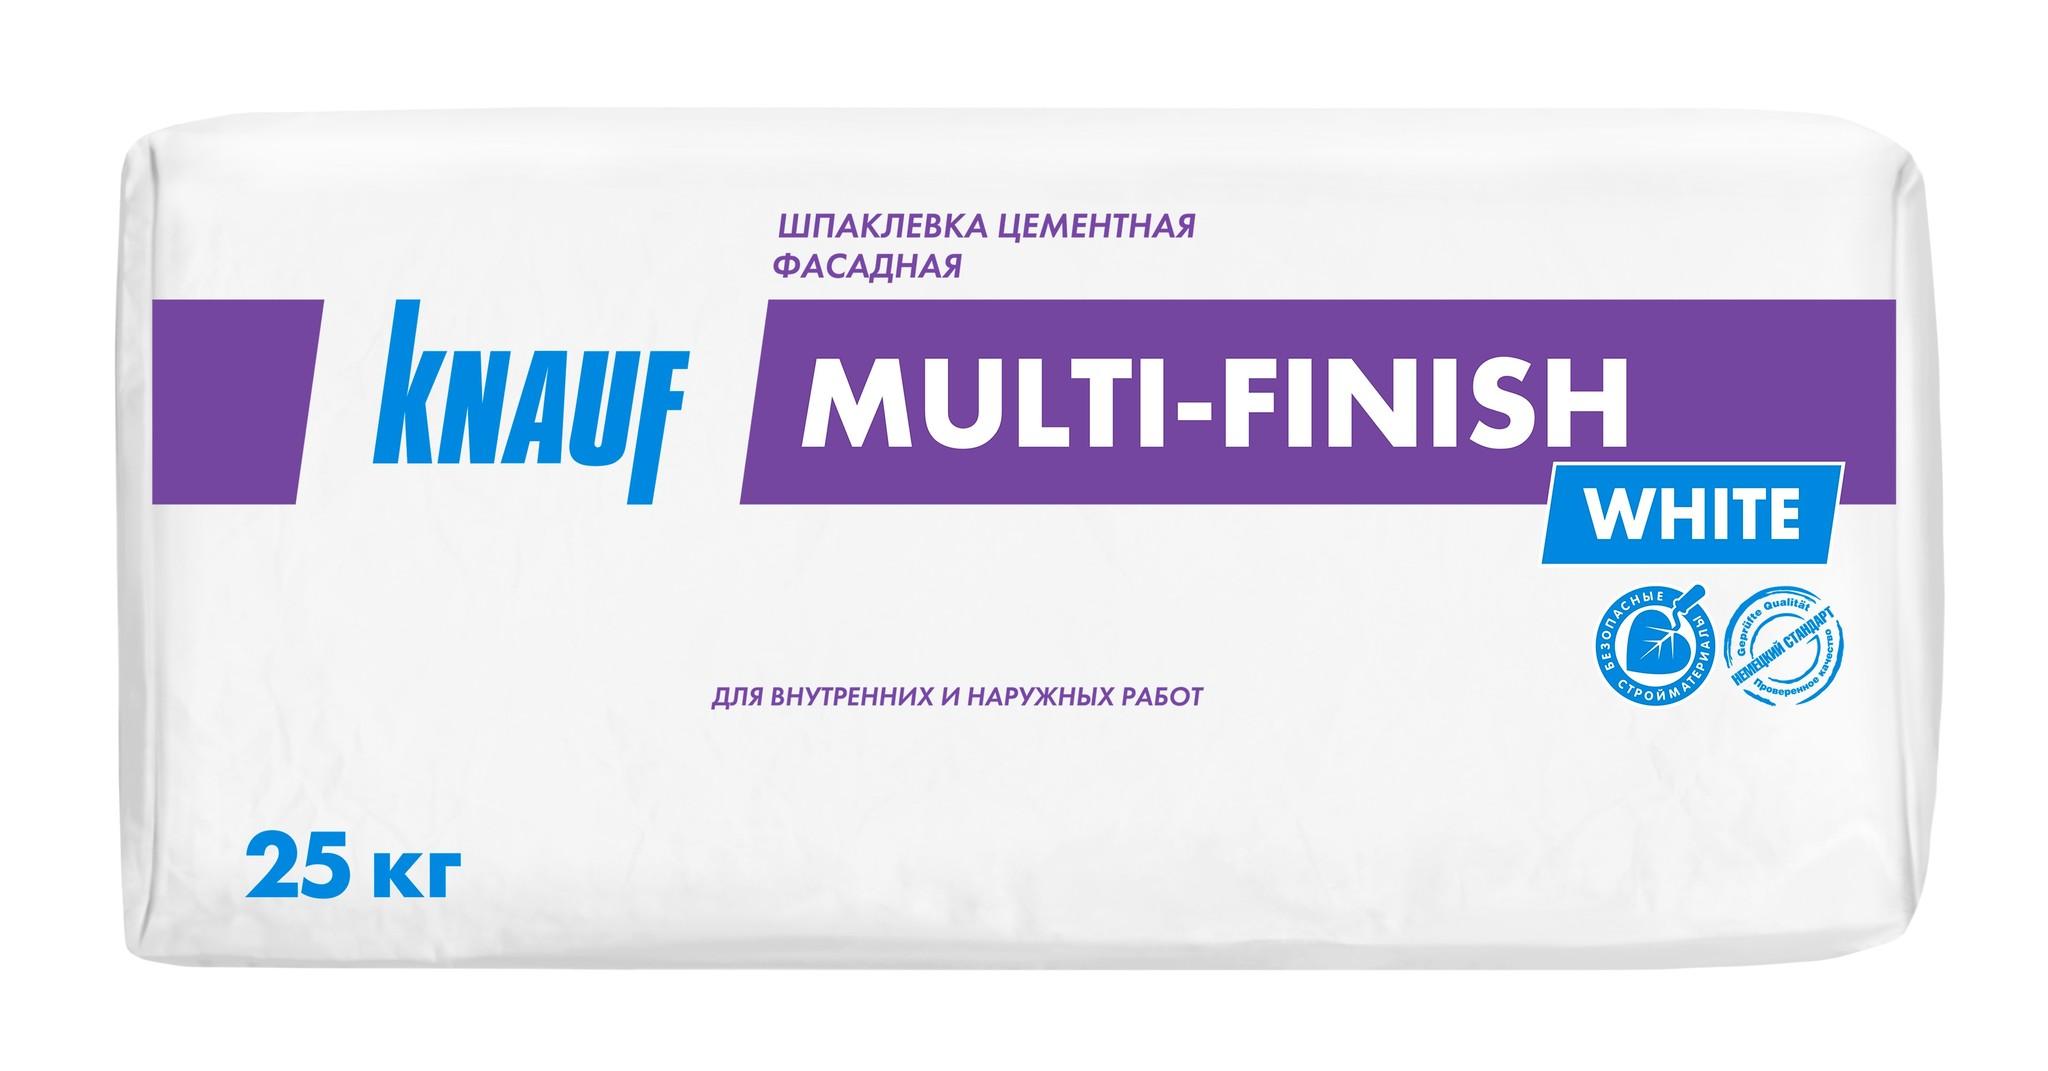 Шпаклевки Шпаклёвка Knauf Мульти-Финиш цементная финишная белая, 25 кг ab504aae14ec484fb3d07670e1822a8a.jpg